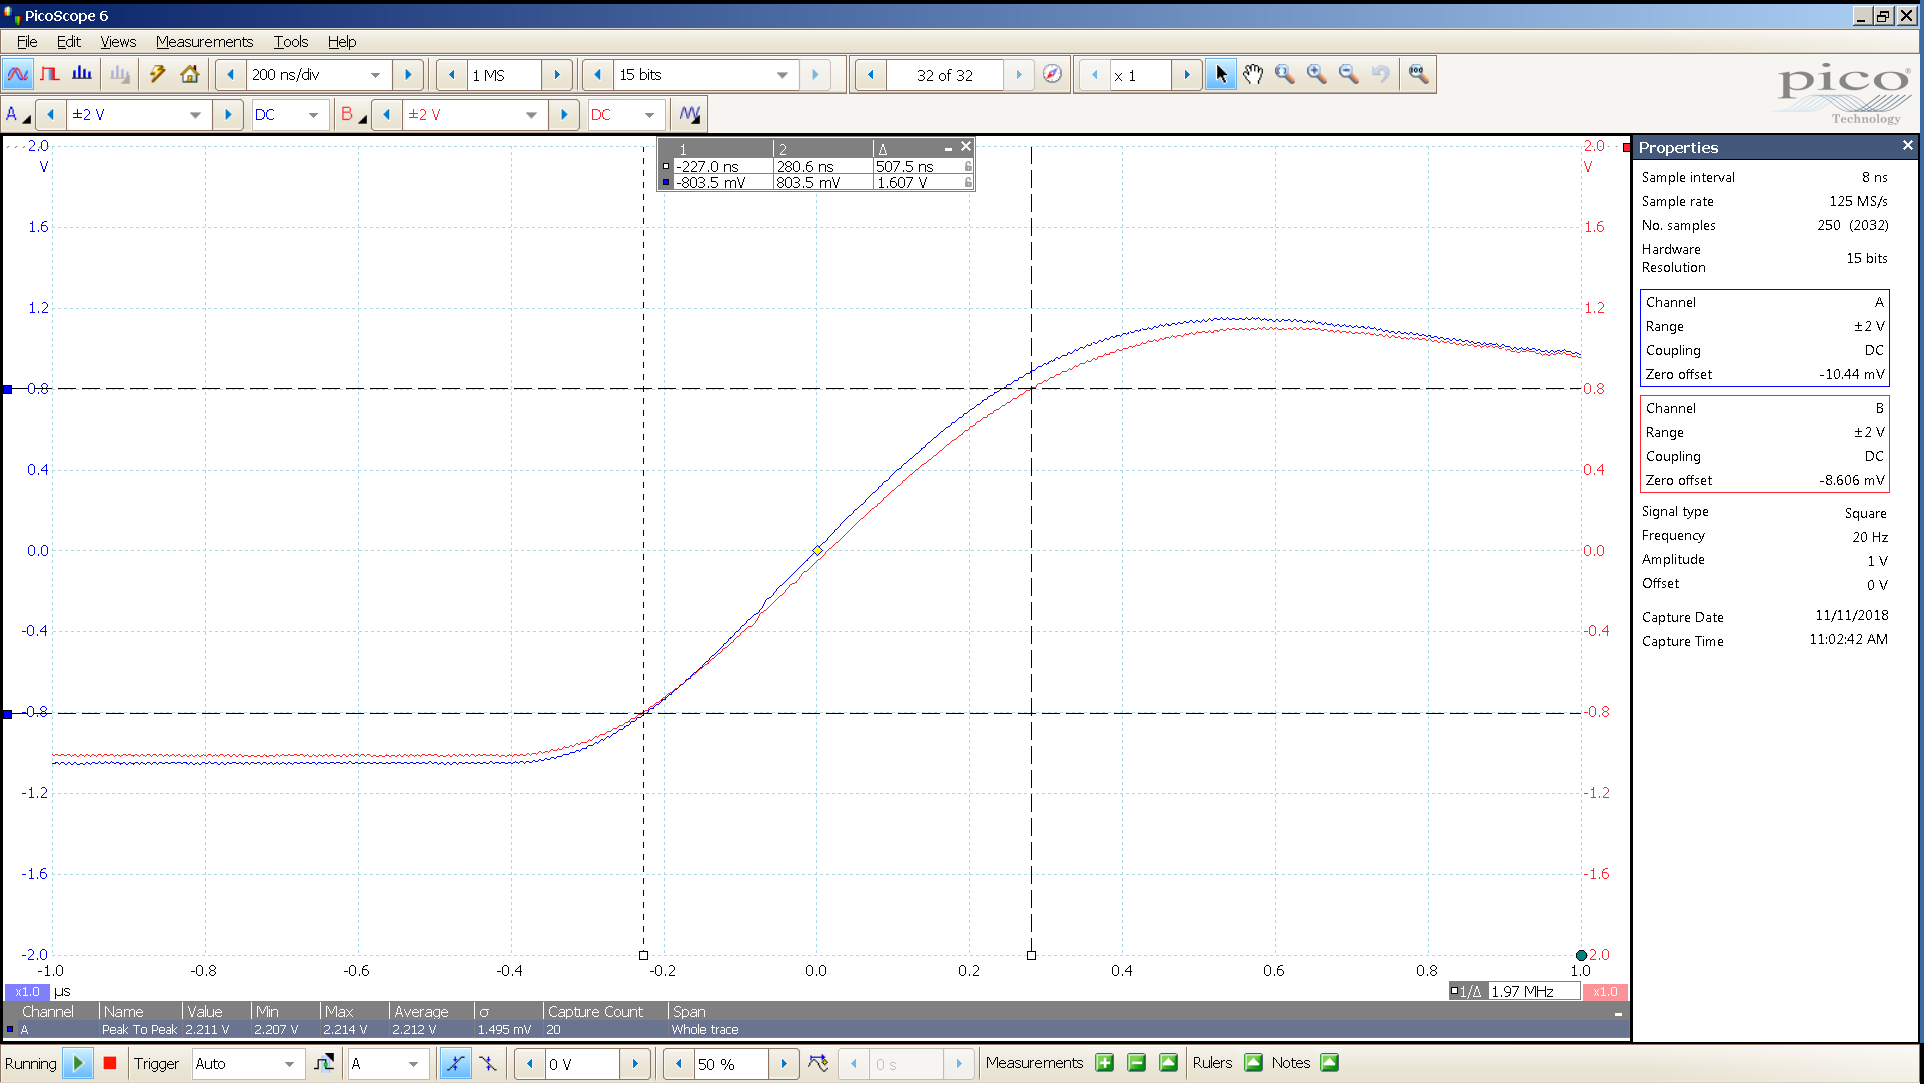 20181110 SigGen LiqPlat 20 Hz square 2000mVpp 200nS div 10MHz filter 300R - BW calc t2.png